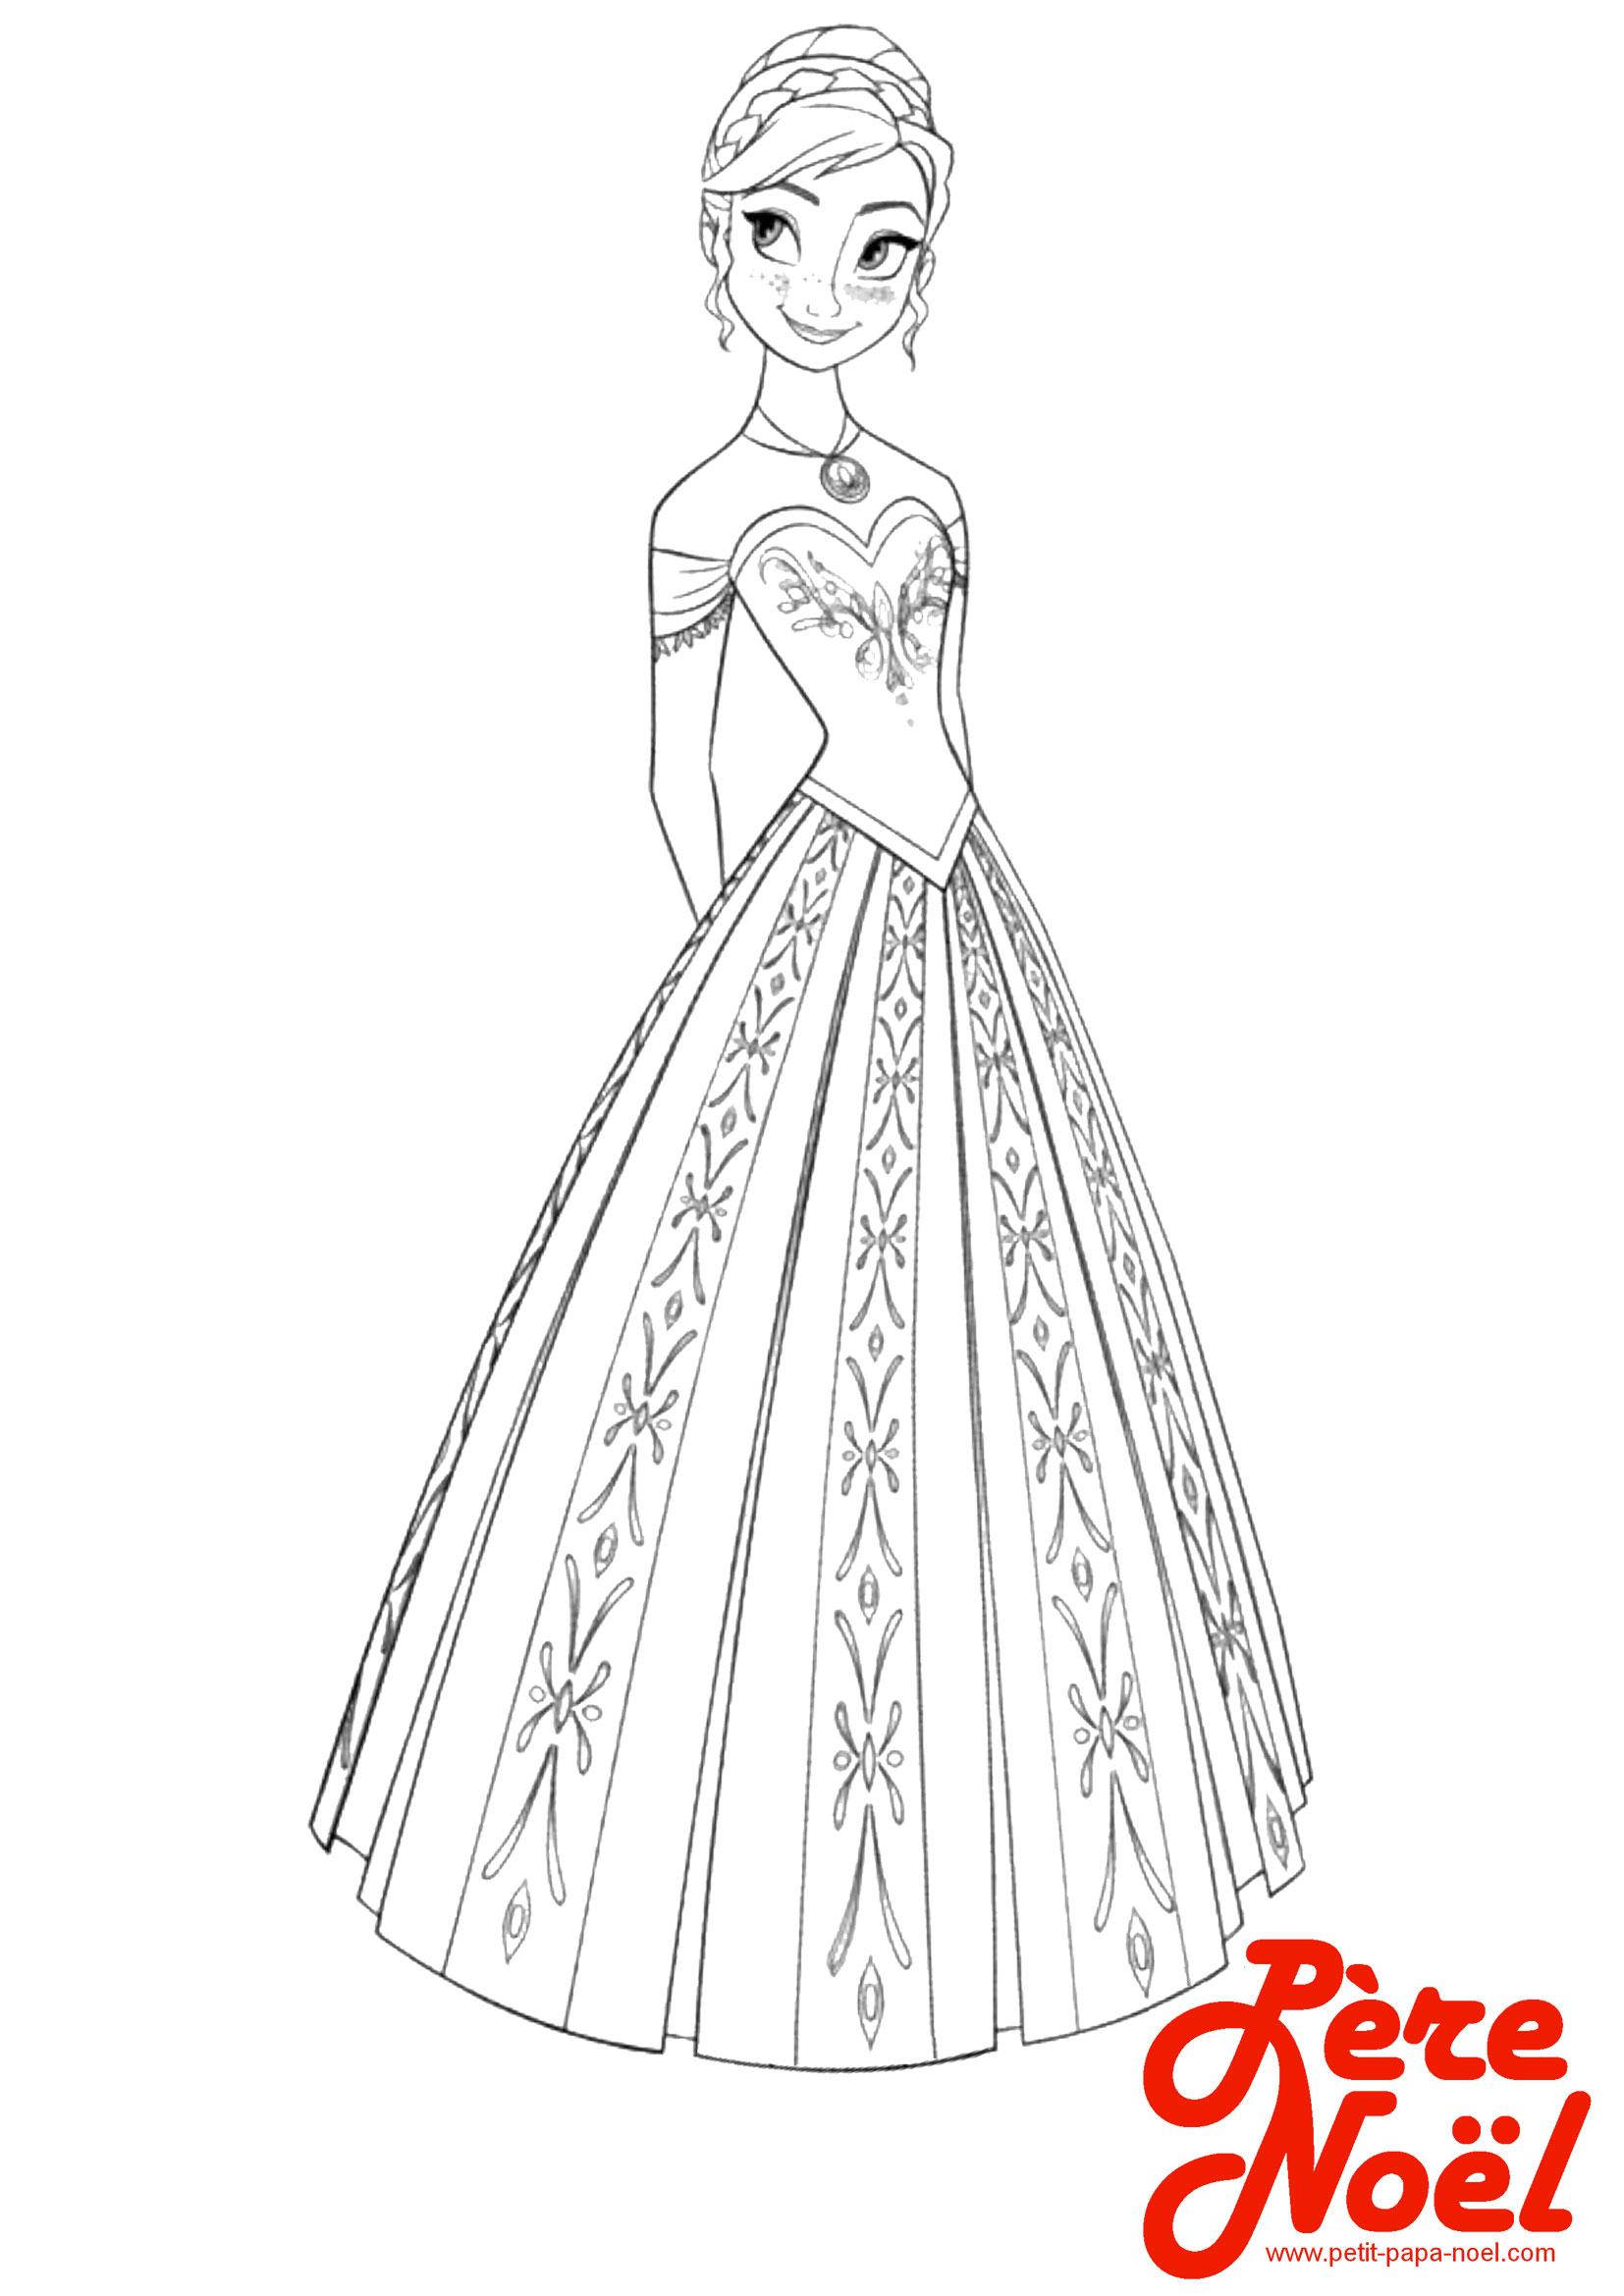 Coloriage Princesse Petit Papa Noel Coloriage Princesse Disney